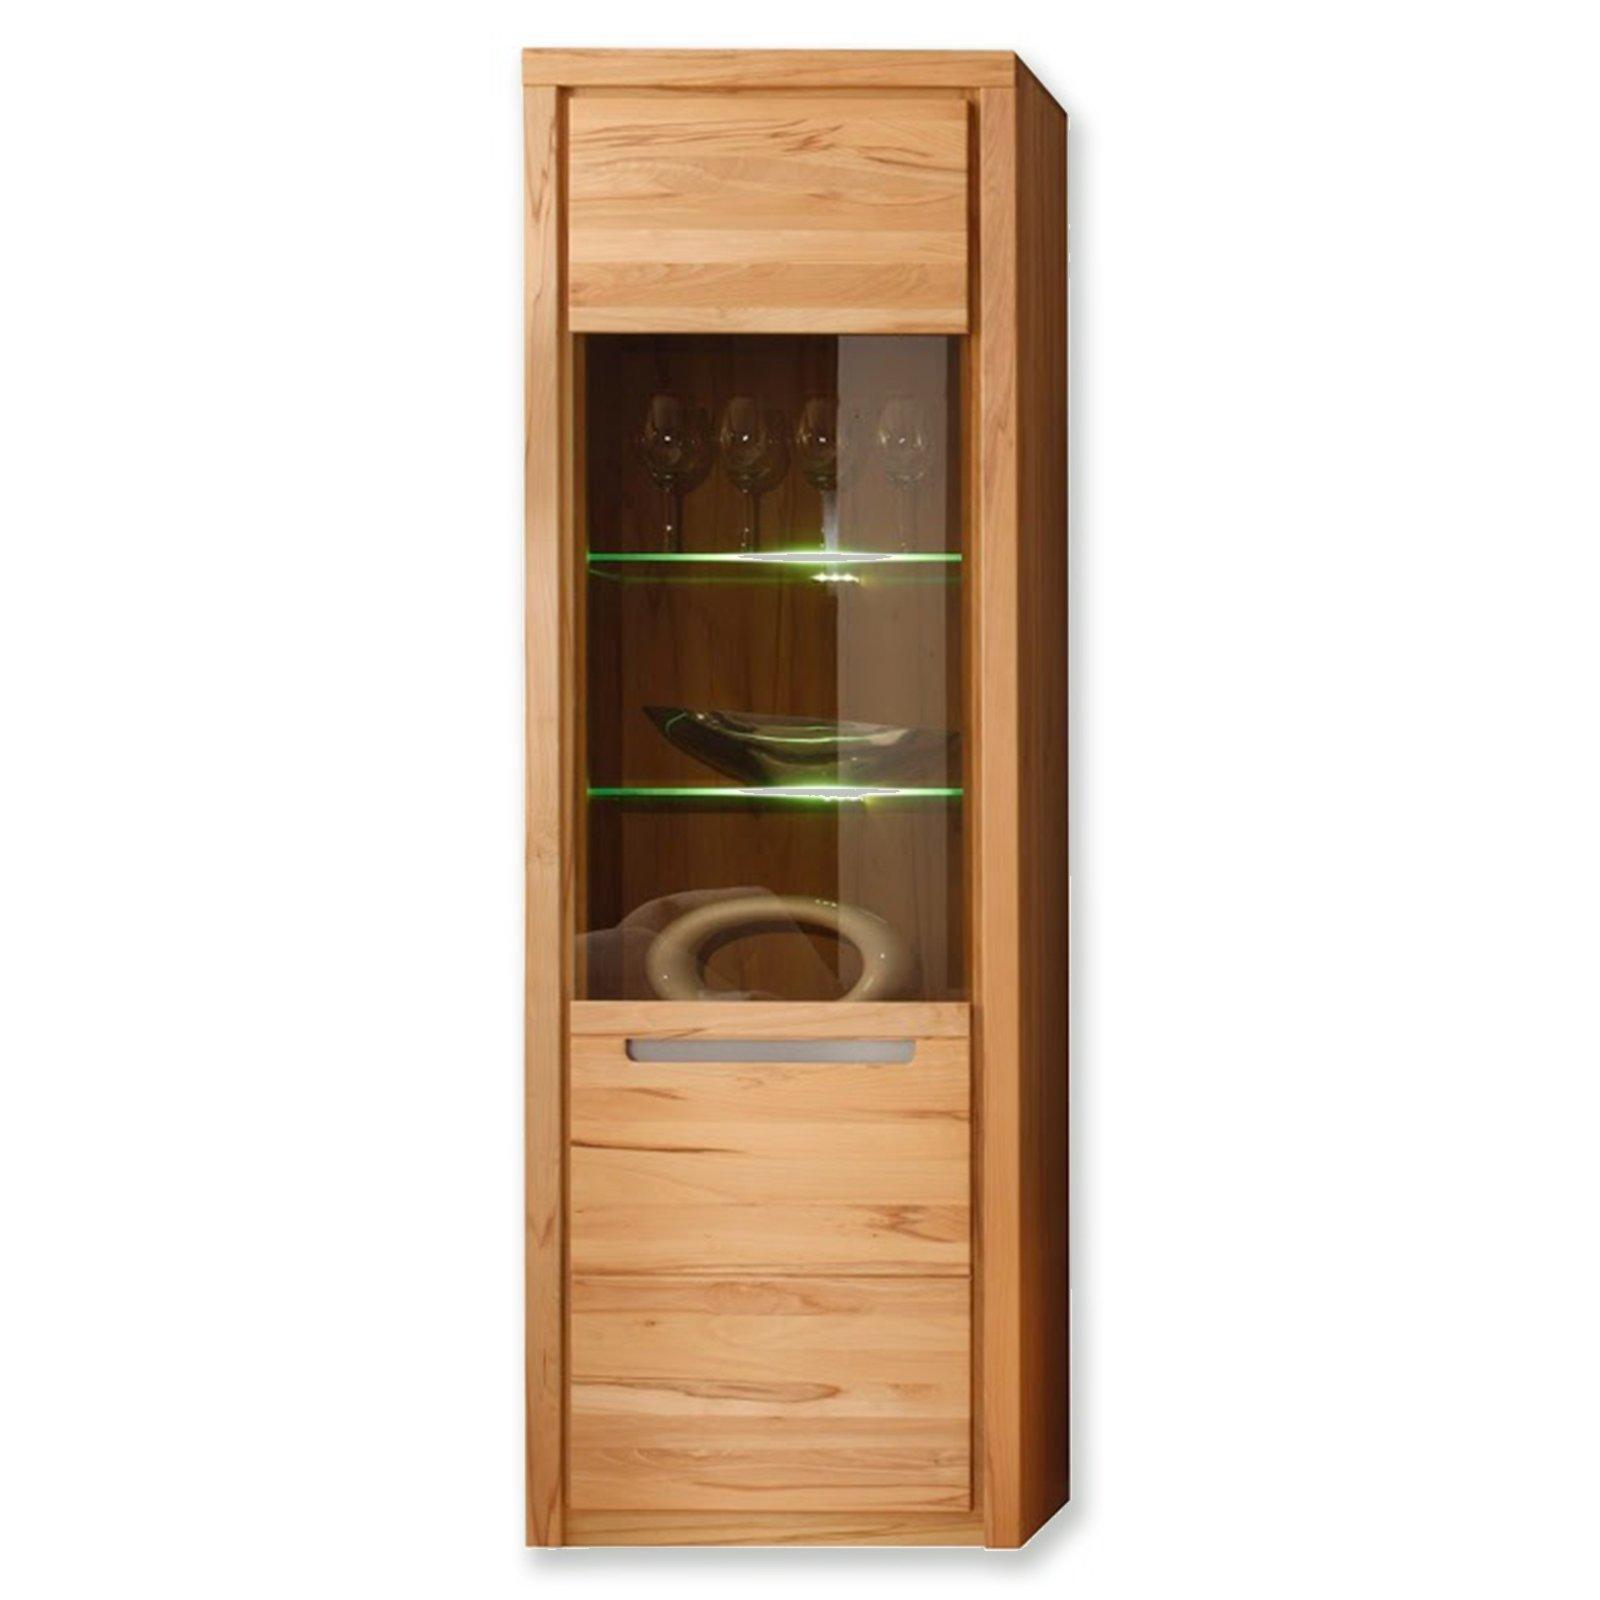 vitrine mit beleuchtung vitrine staubdicht 100 cm breit glasvitrinen alu vitrinen g nstig. Black Bedroom Furniture Sets. Home Design Ideas